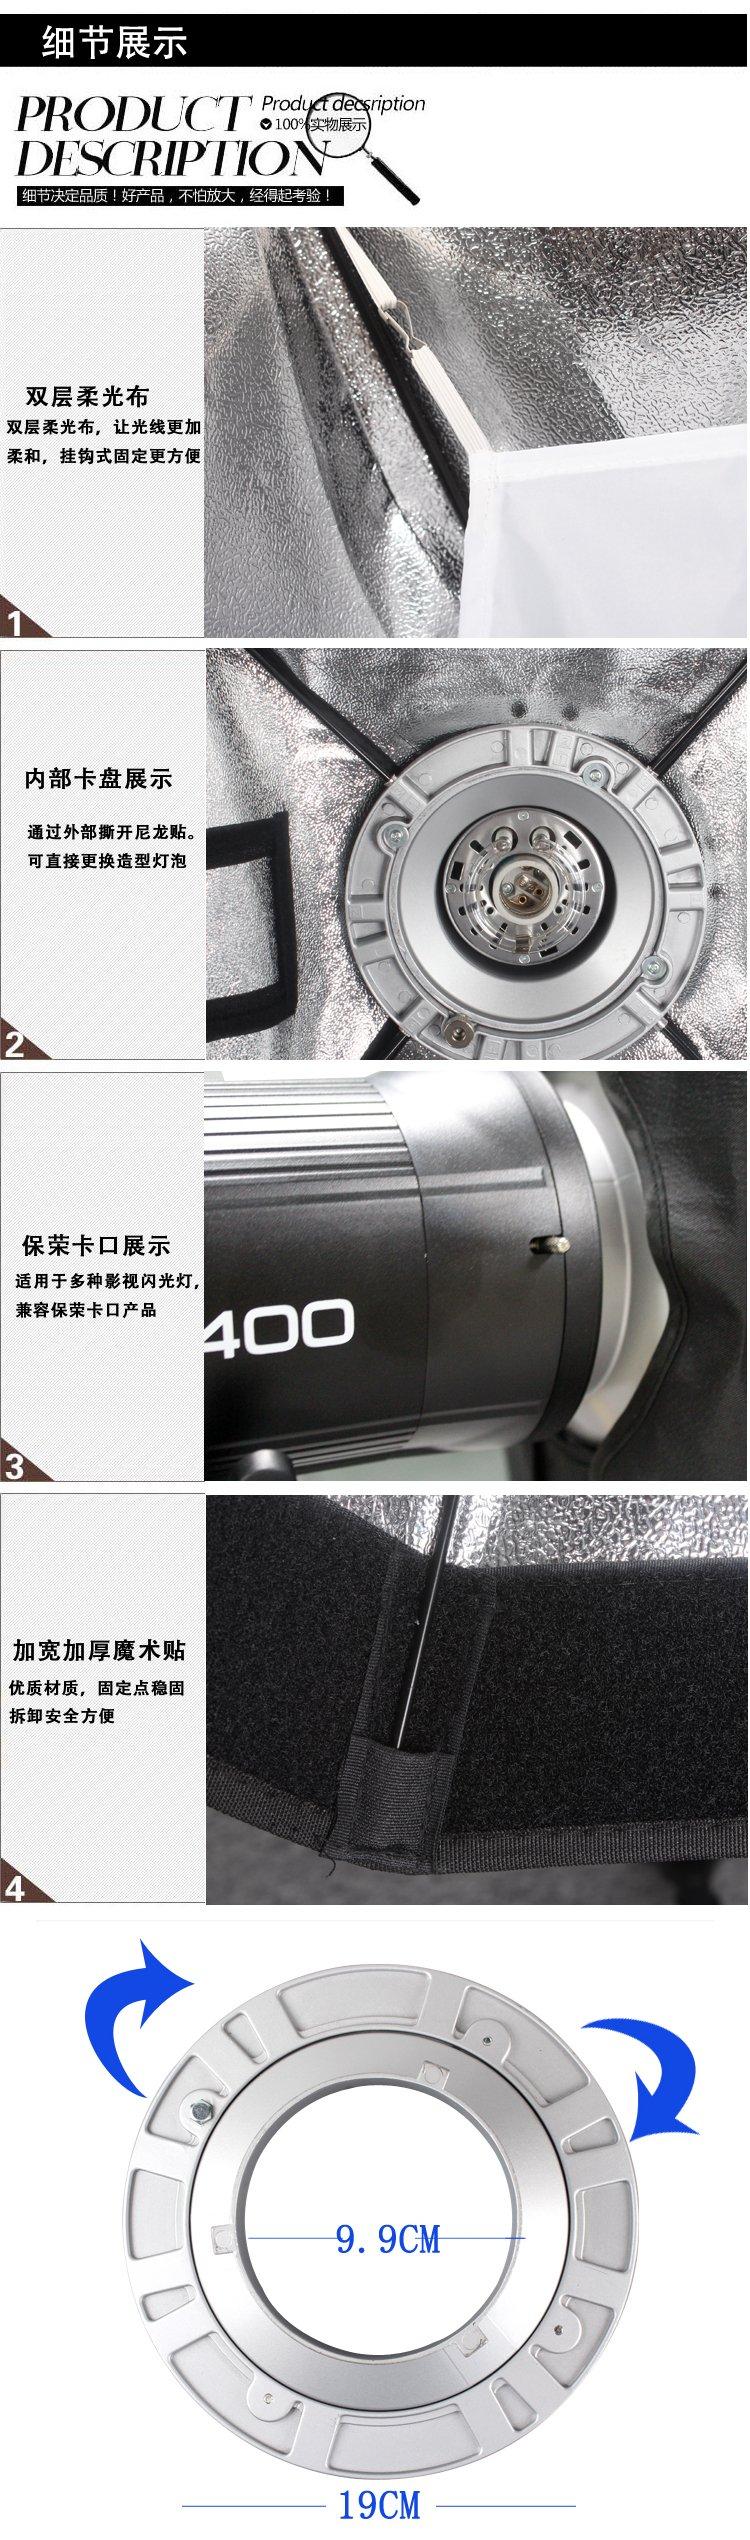 Godox 80cmx120 cm / 32''x48'' Softbox lighting with Grid Beehive & Bowens Mount Speedring for Studio Photo Flash Speedlight Light + SUPON USB LED (80cmx120cm with Grid)